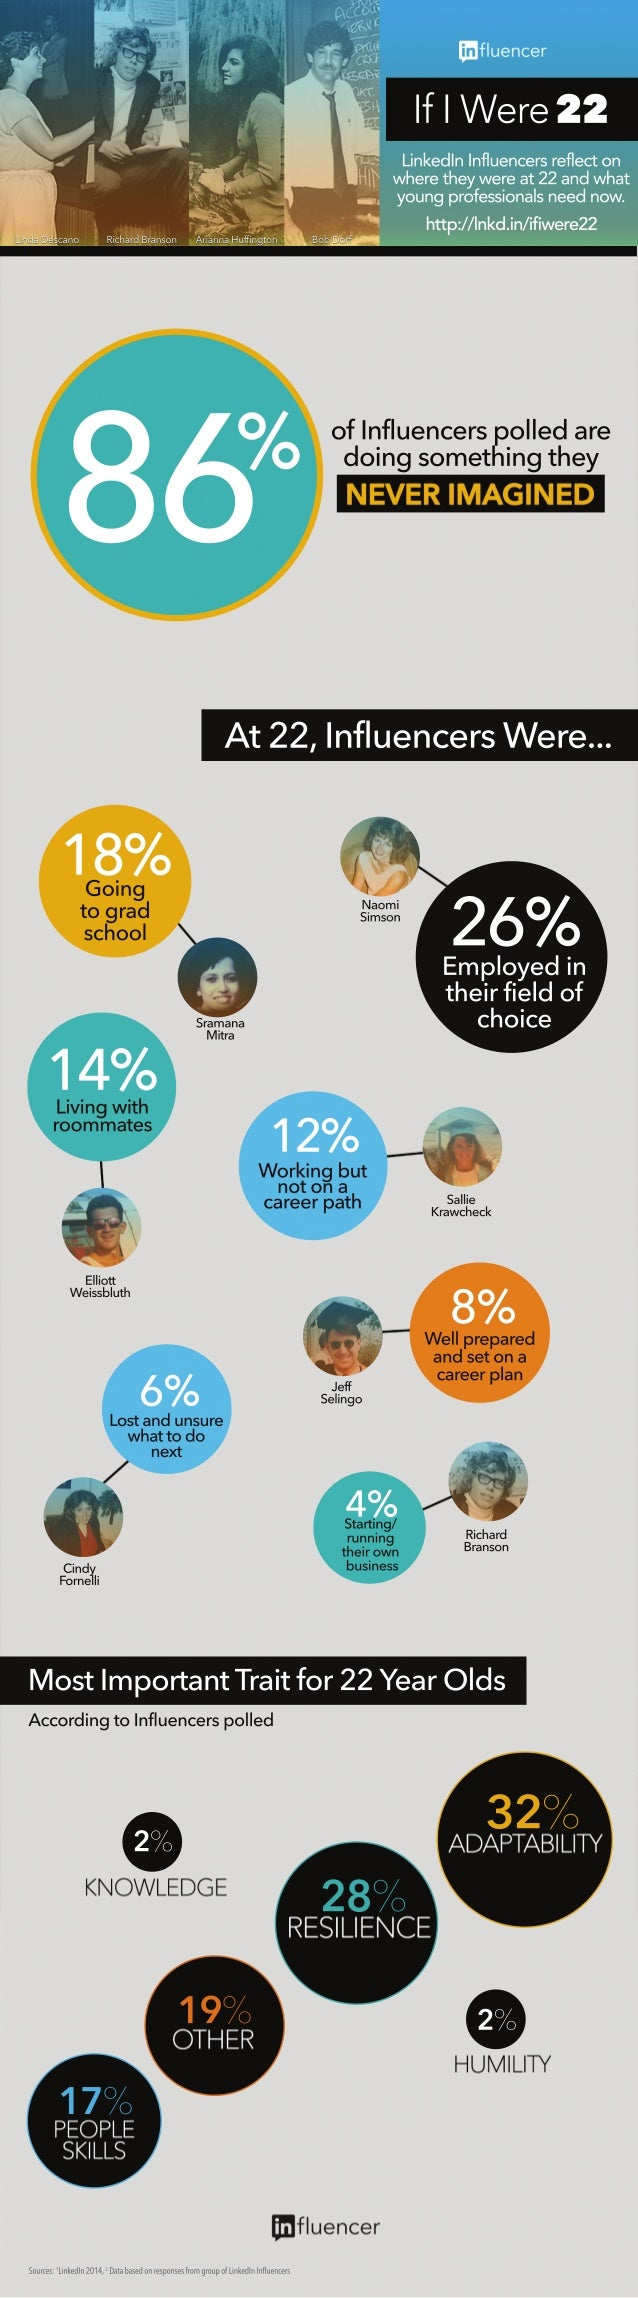 Sources:1 LinkedIn2014,2 DatabasedonresponsesfromgroupofLinkedInInfluencers 32% 28% 19% 17% 2% 2% Employedin theirfieldof ...